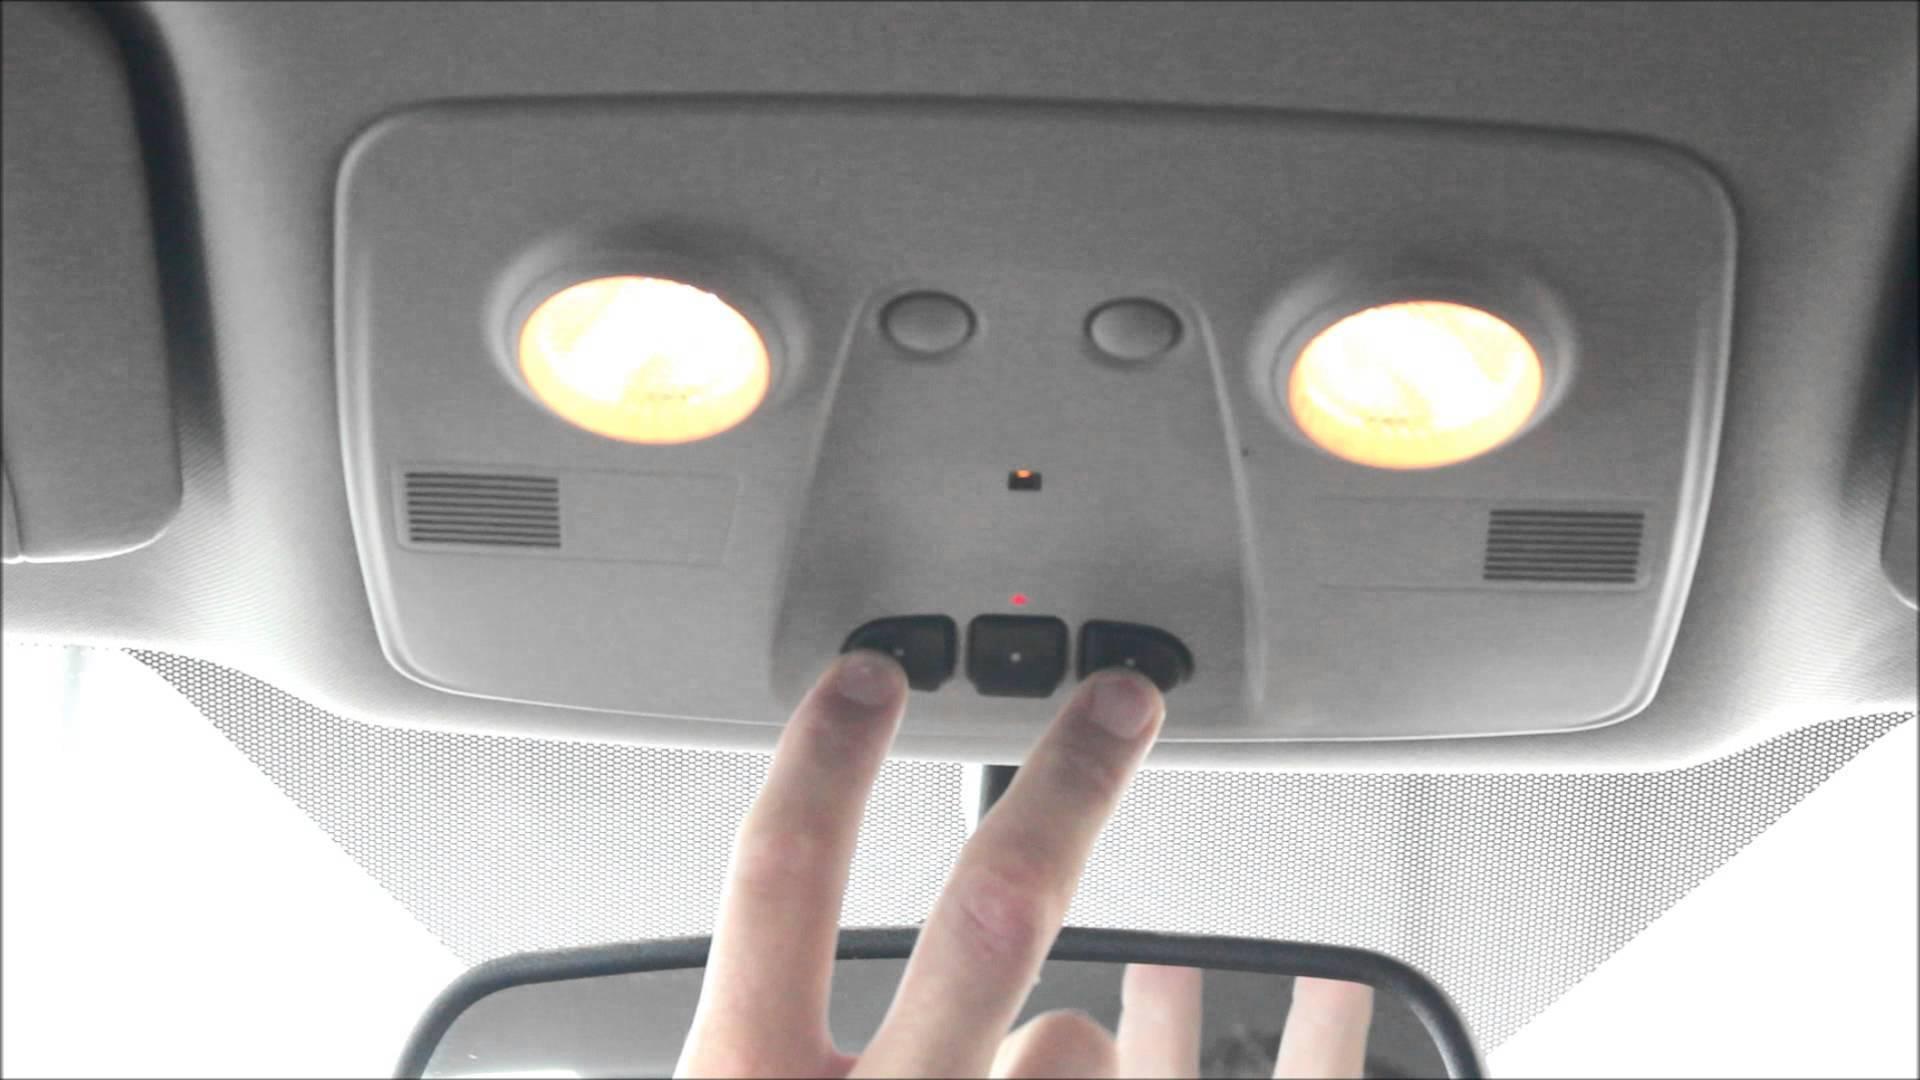 Chevrolet Silverado How To Program Homelink Chevroletforum